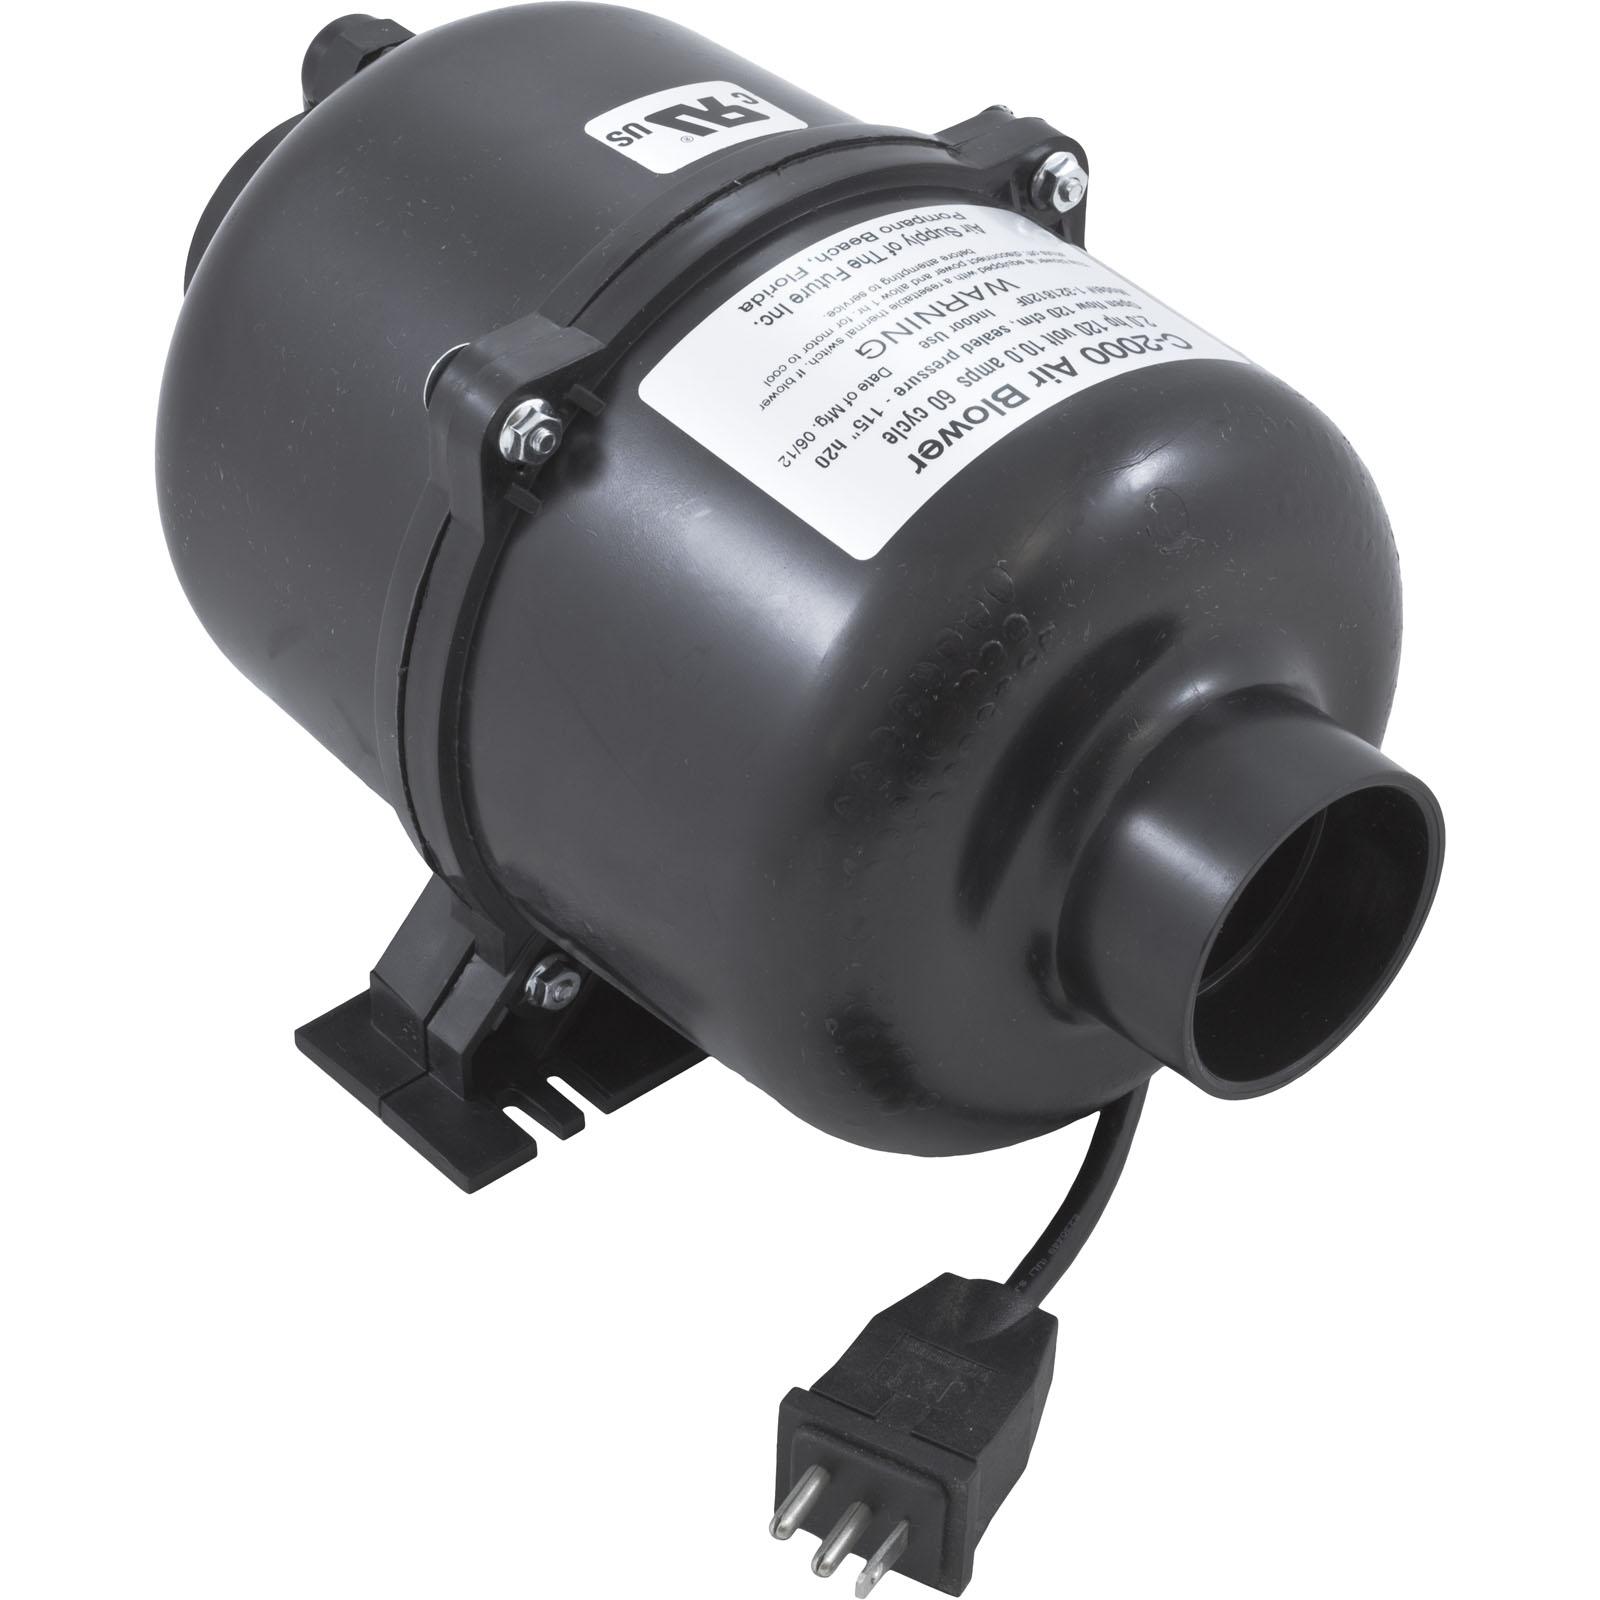 Blower Air Supply Comet 2000 2 0hp 115v 10 0a Mini